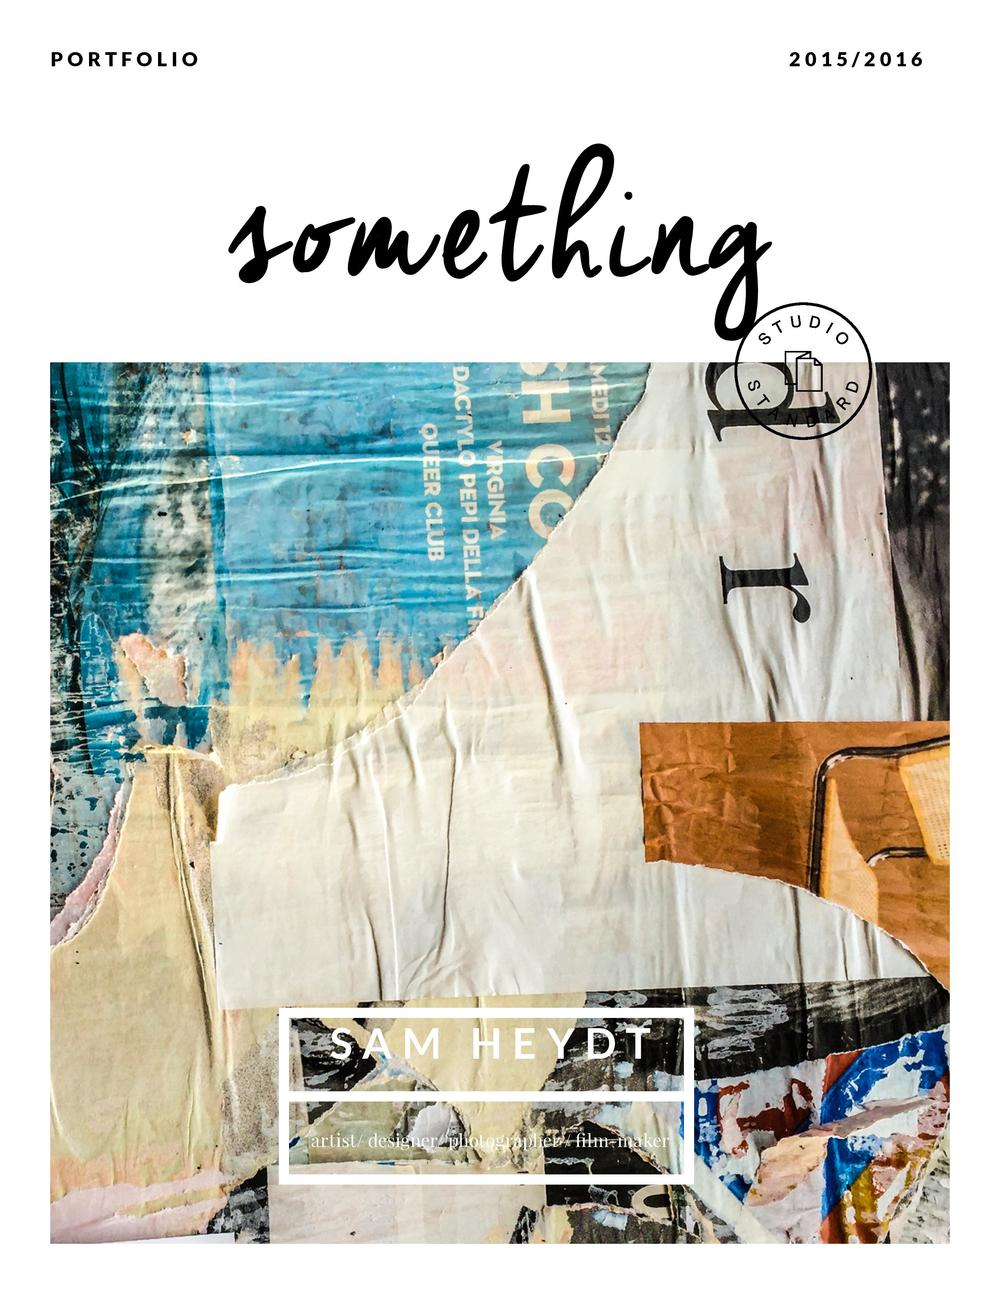 something-HEYDT-page-001.jpg